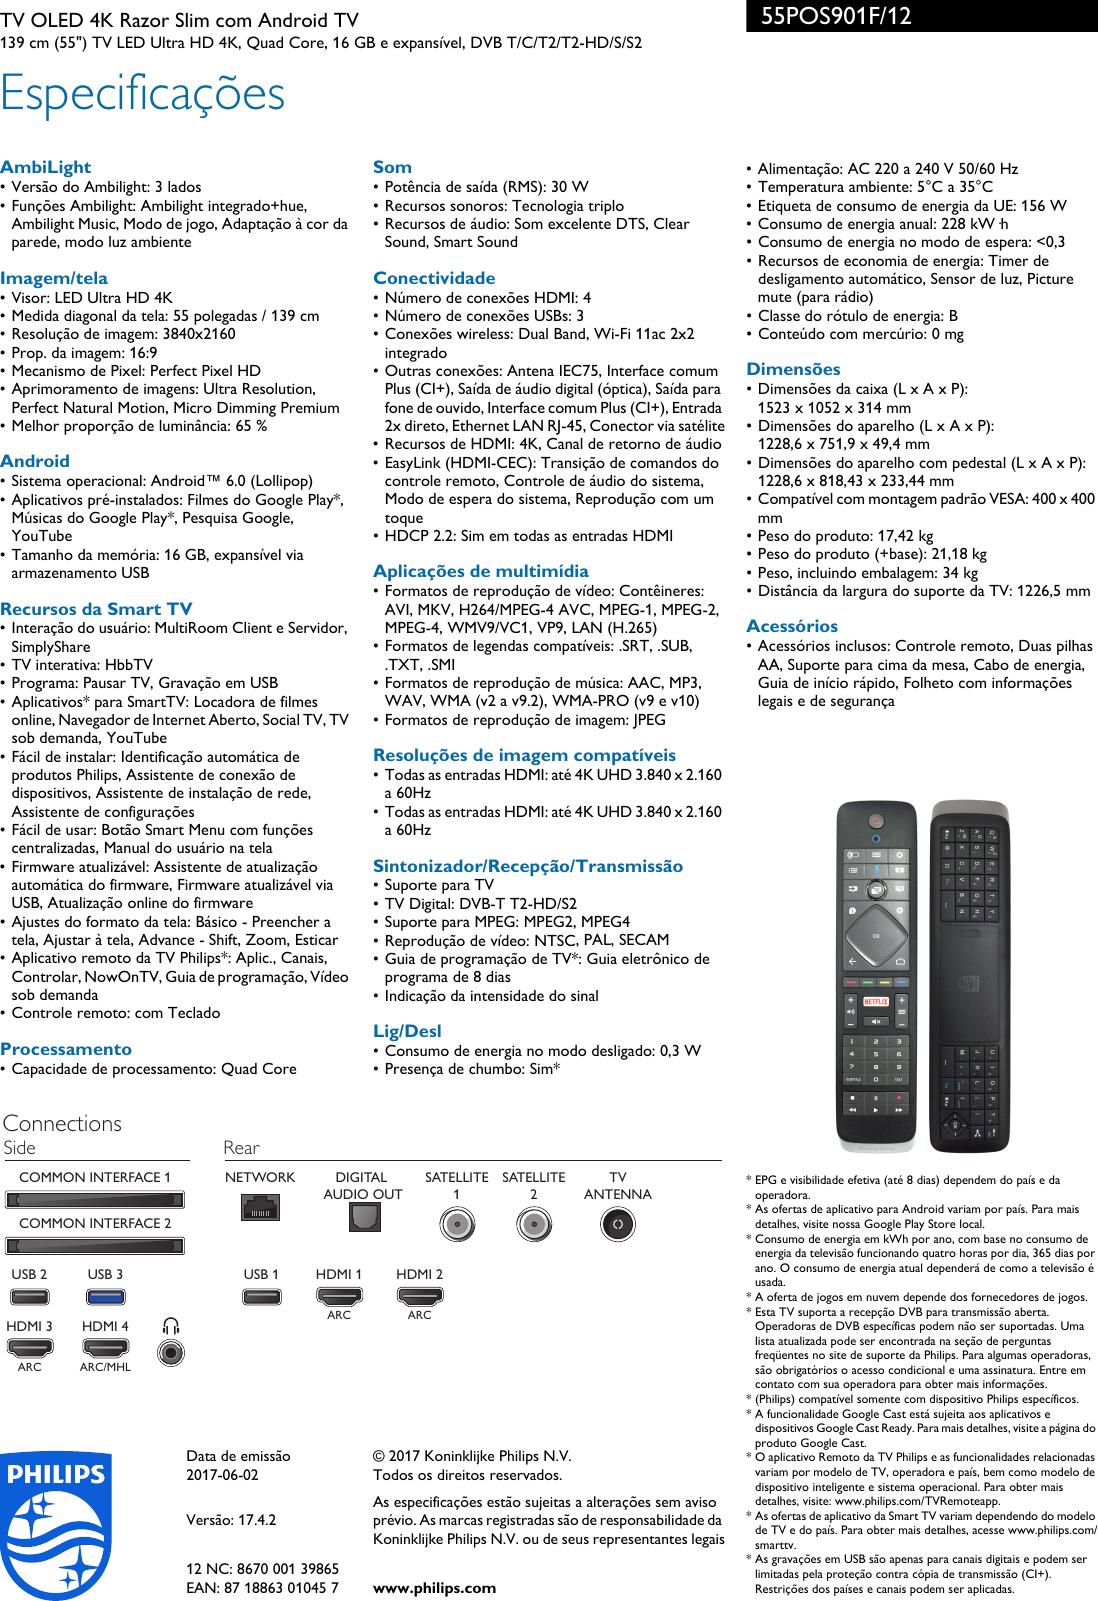 Page 3 of 3 - Philips 55POS901F 12 4K Razor Slim OLED TV Equipado Com ca79402338b8